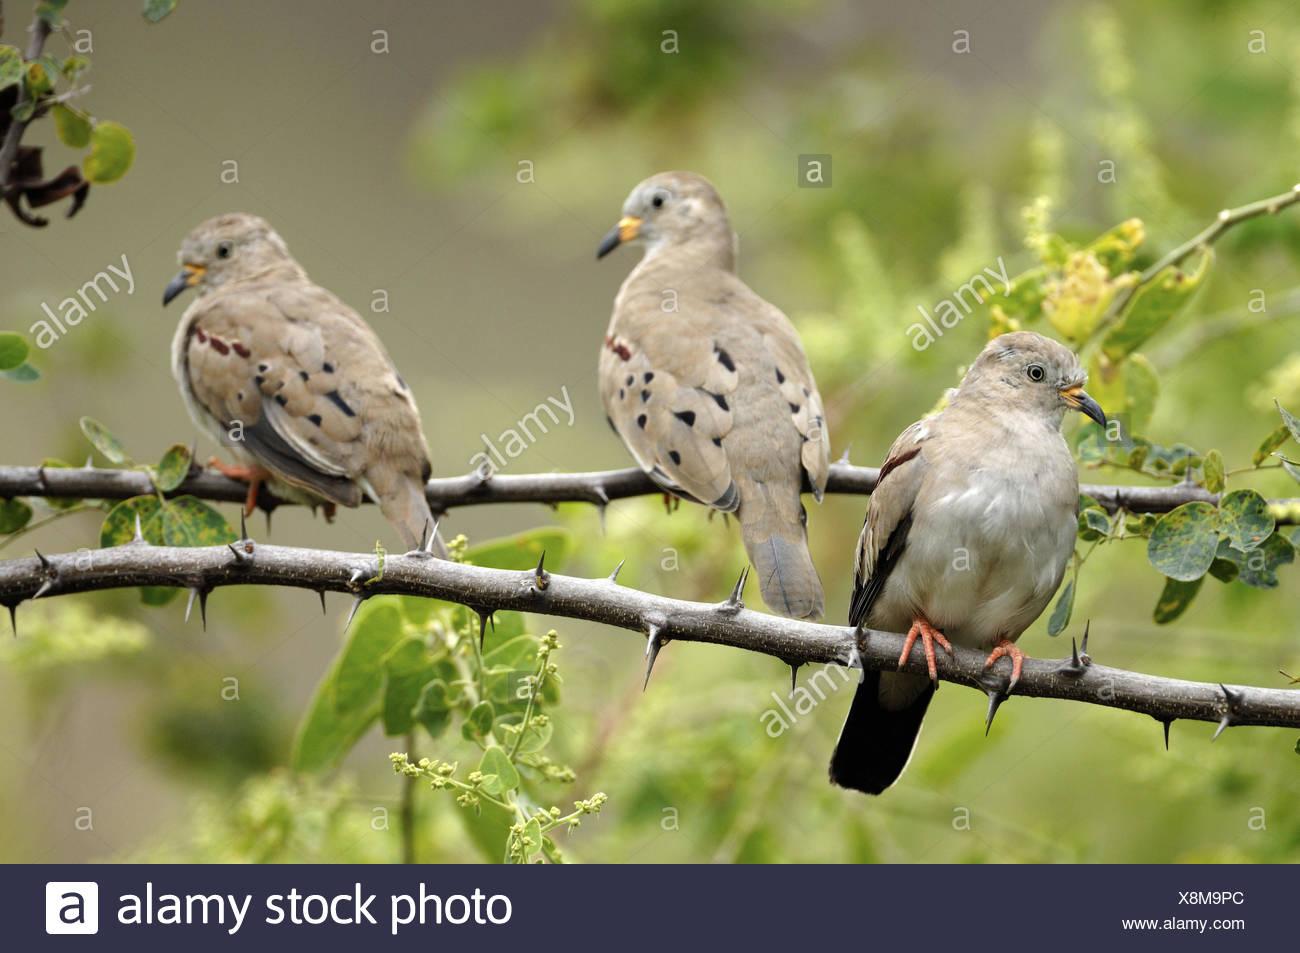 Croaking ground doves (Columbina cruziana) Chaparri Ecological Reserve, Peru, South America Stock Photo